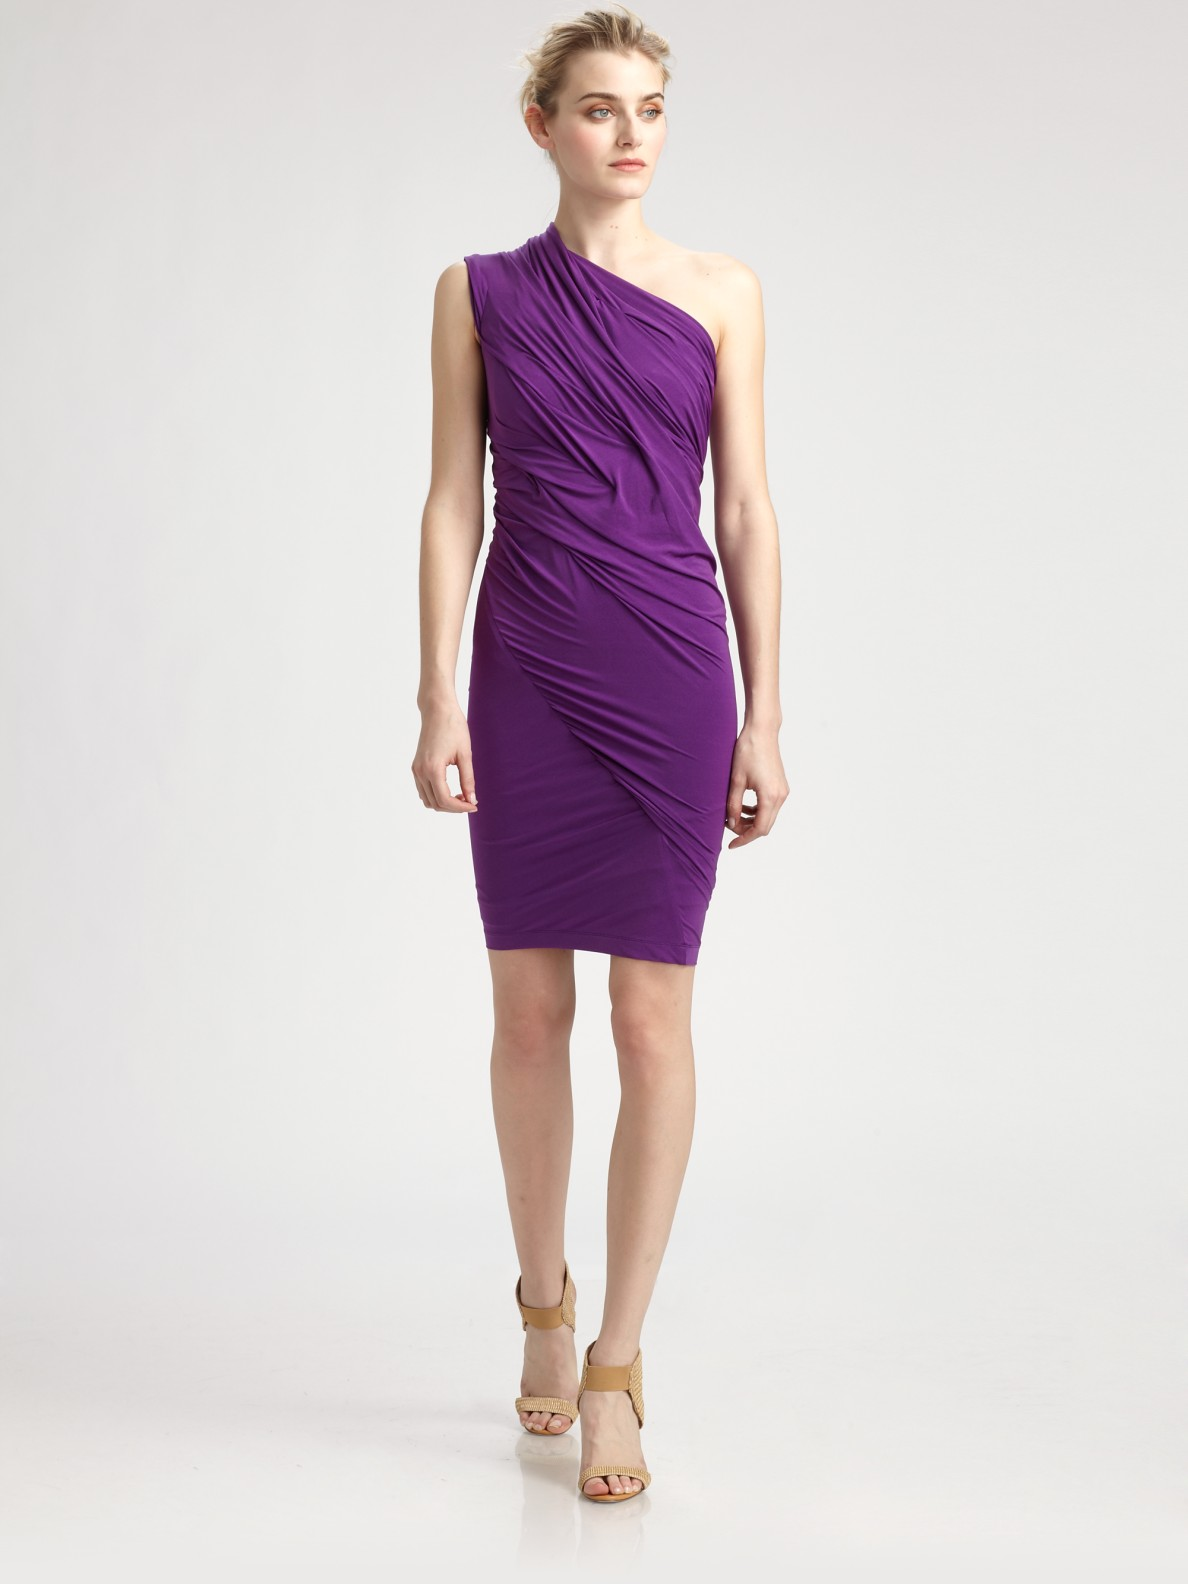 Donna karan new york asymmetrical stretch dress in purple for Donna karan new york